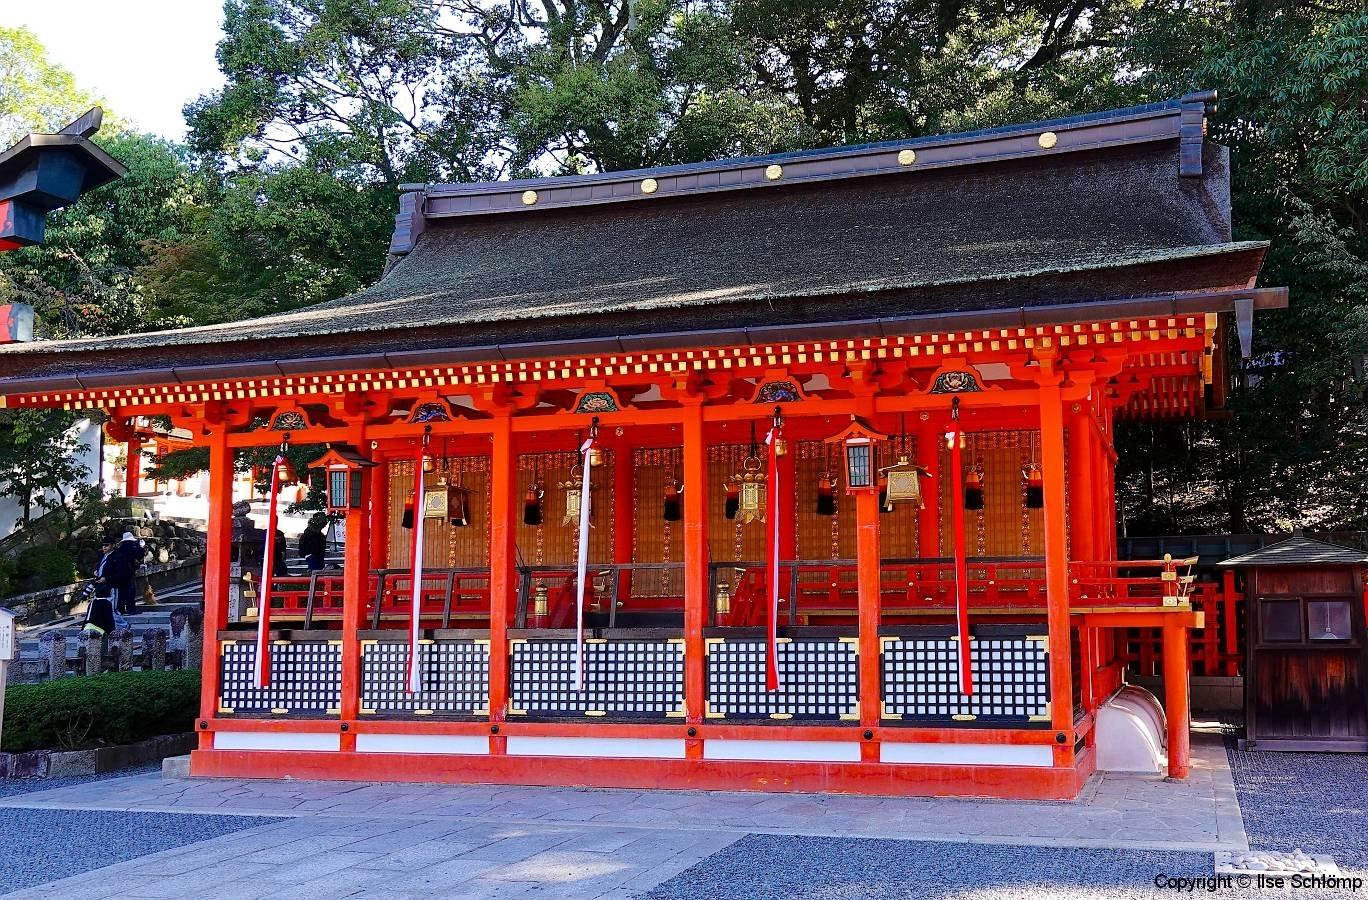 Japan, Kyoto, Fushimi Inari Schrein